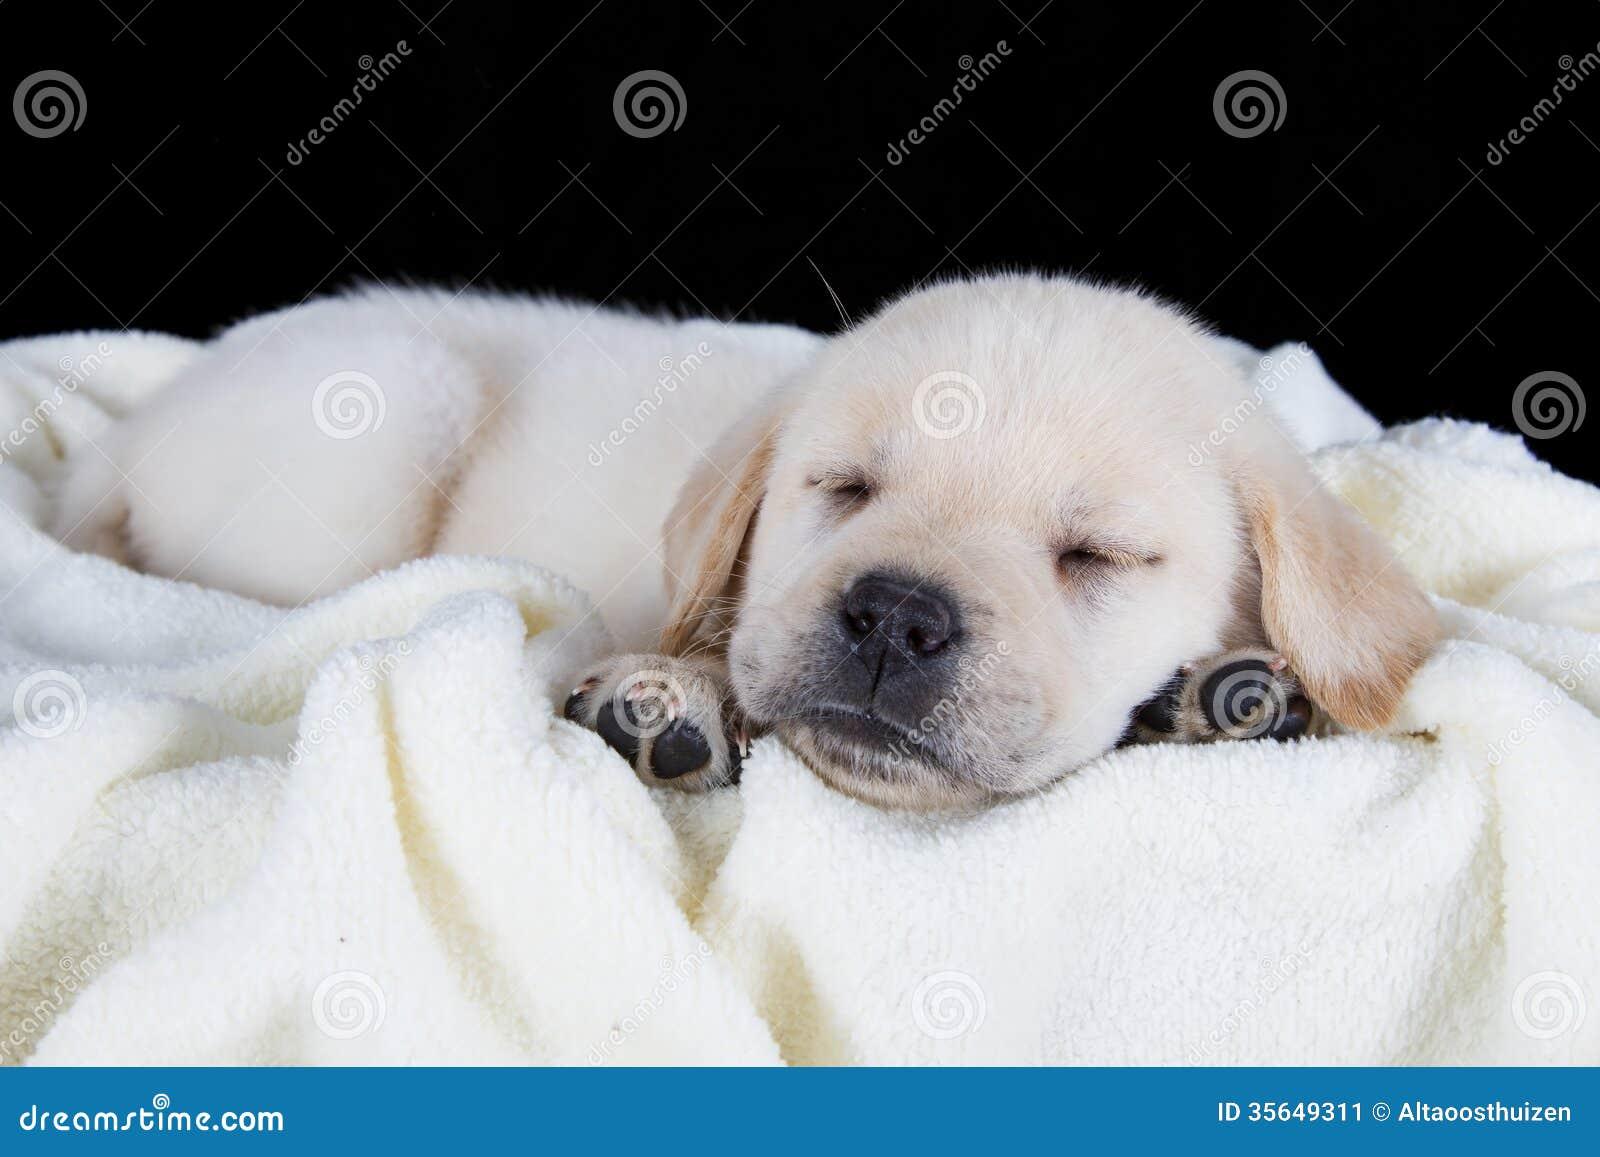 Puppy Labrador Sleeping On White Fluffy Blanket Stock